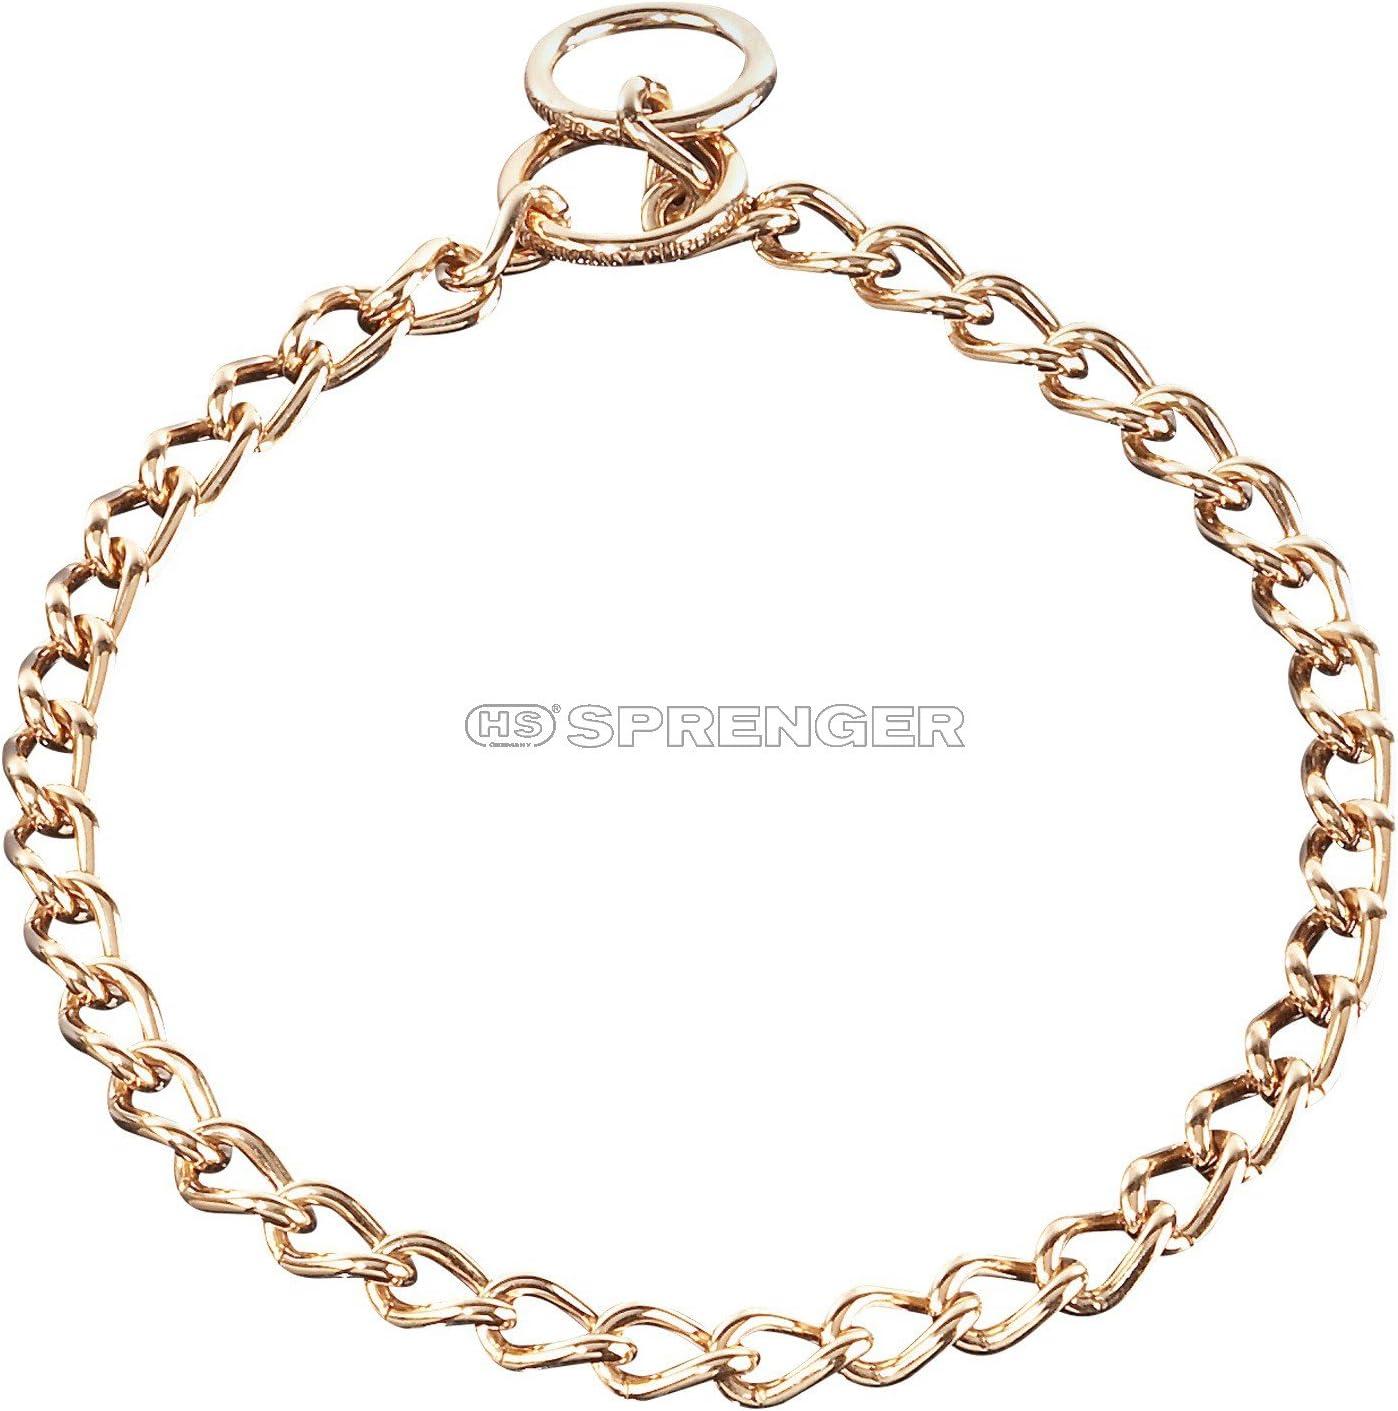 Herm Sprenger 26 Inch 65cm Curogan Slip mm Choke Col 3.0 Chain Selling Seattle Mall